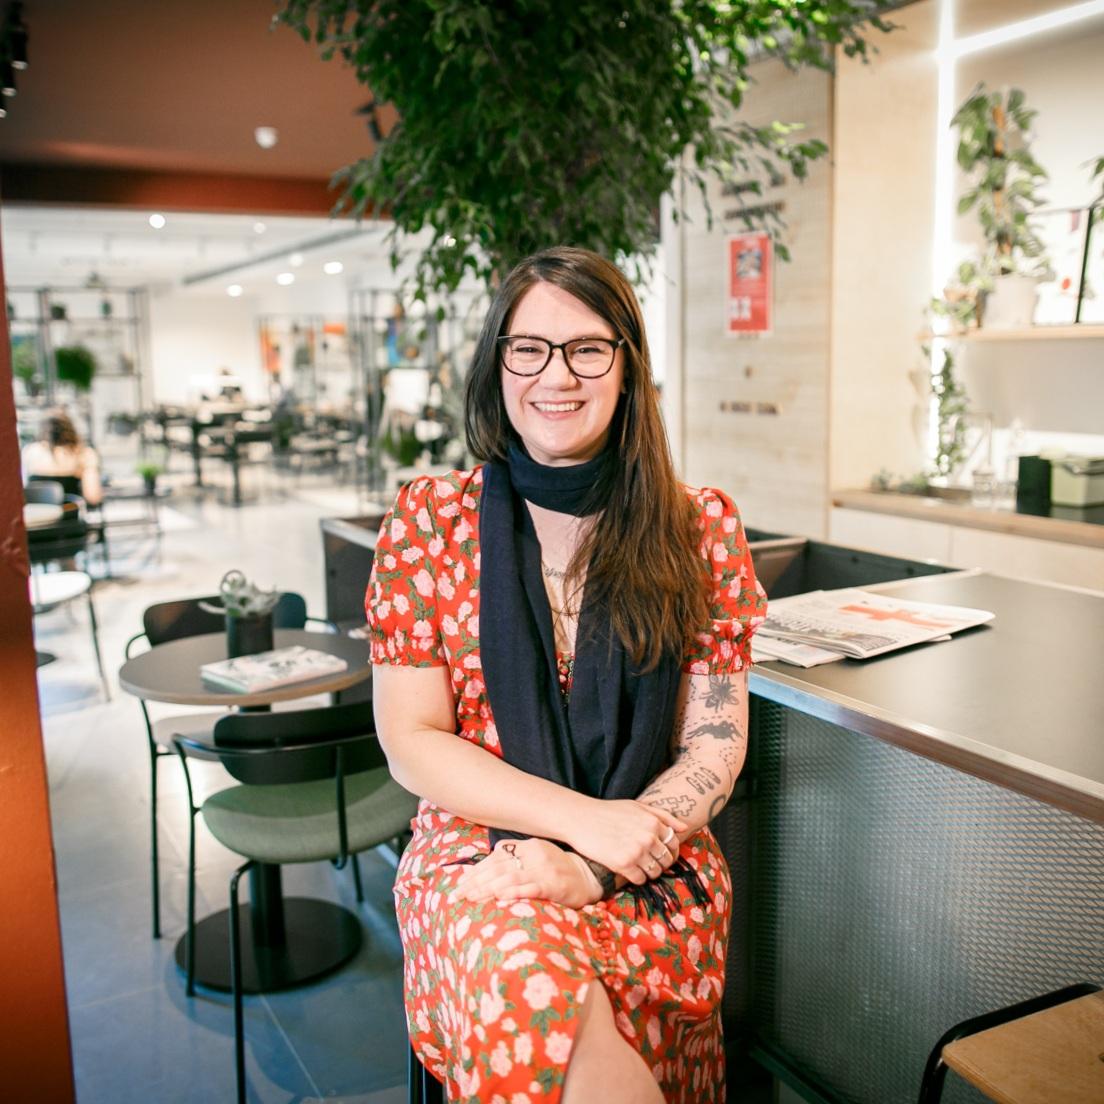 Meet x+why member Sarah Corbett